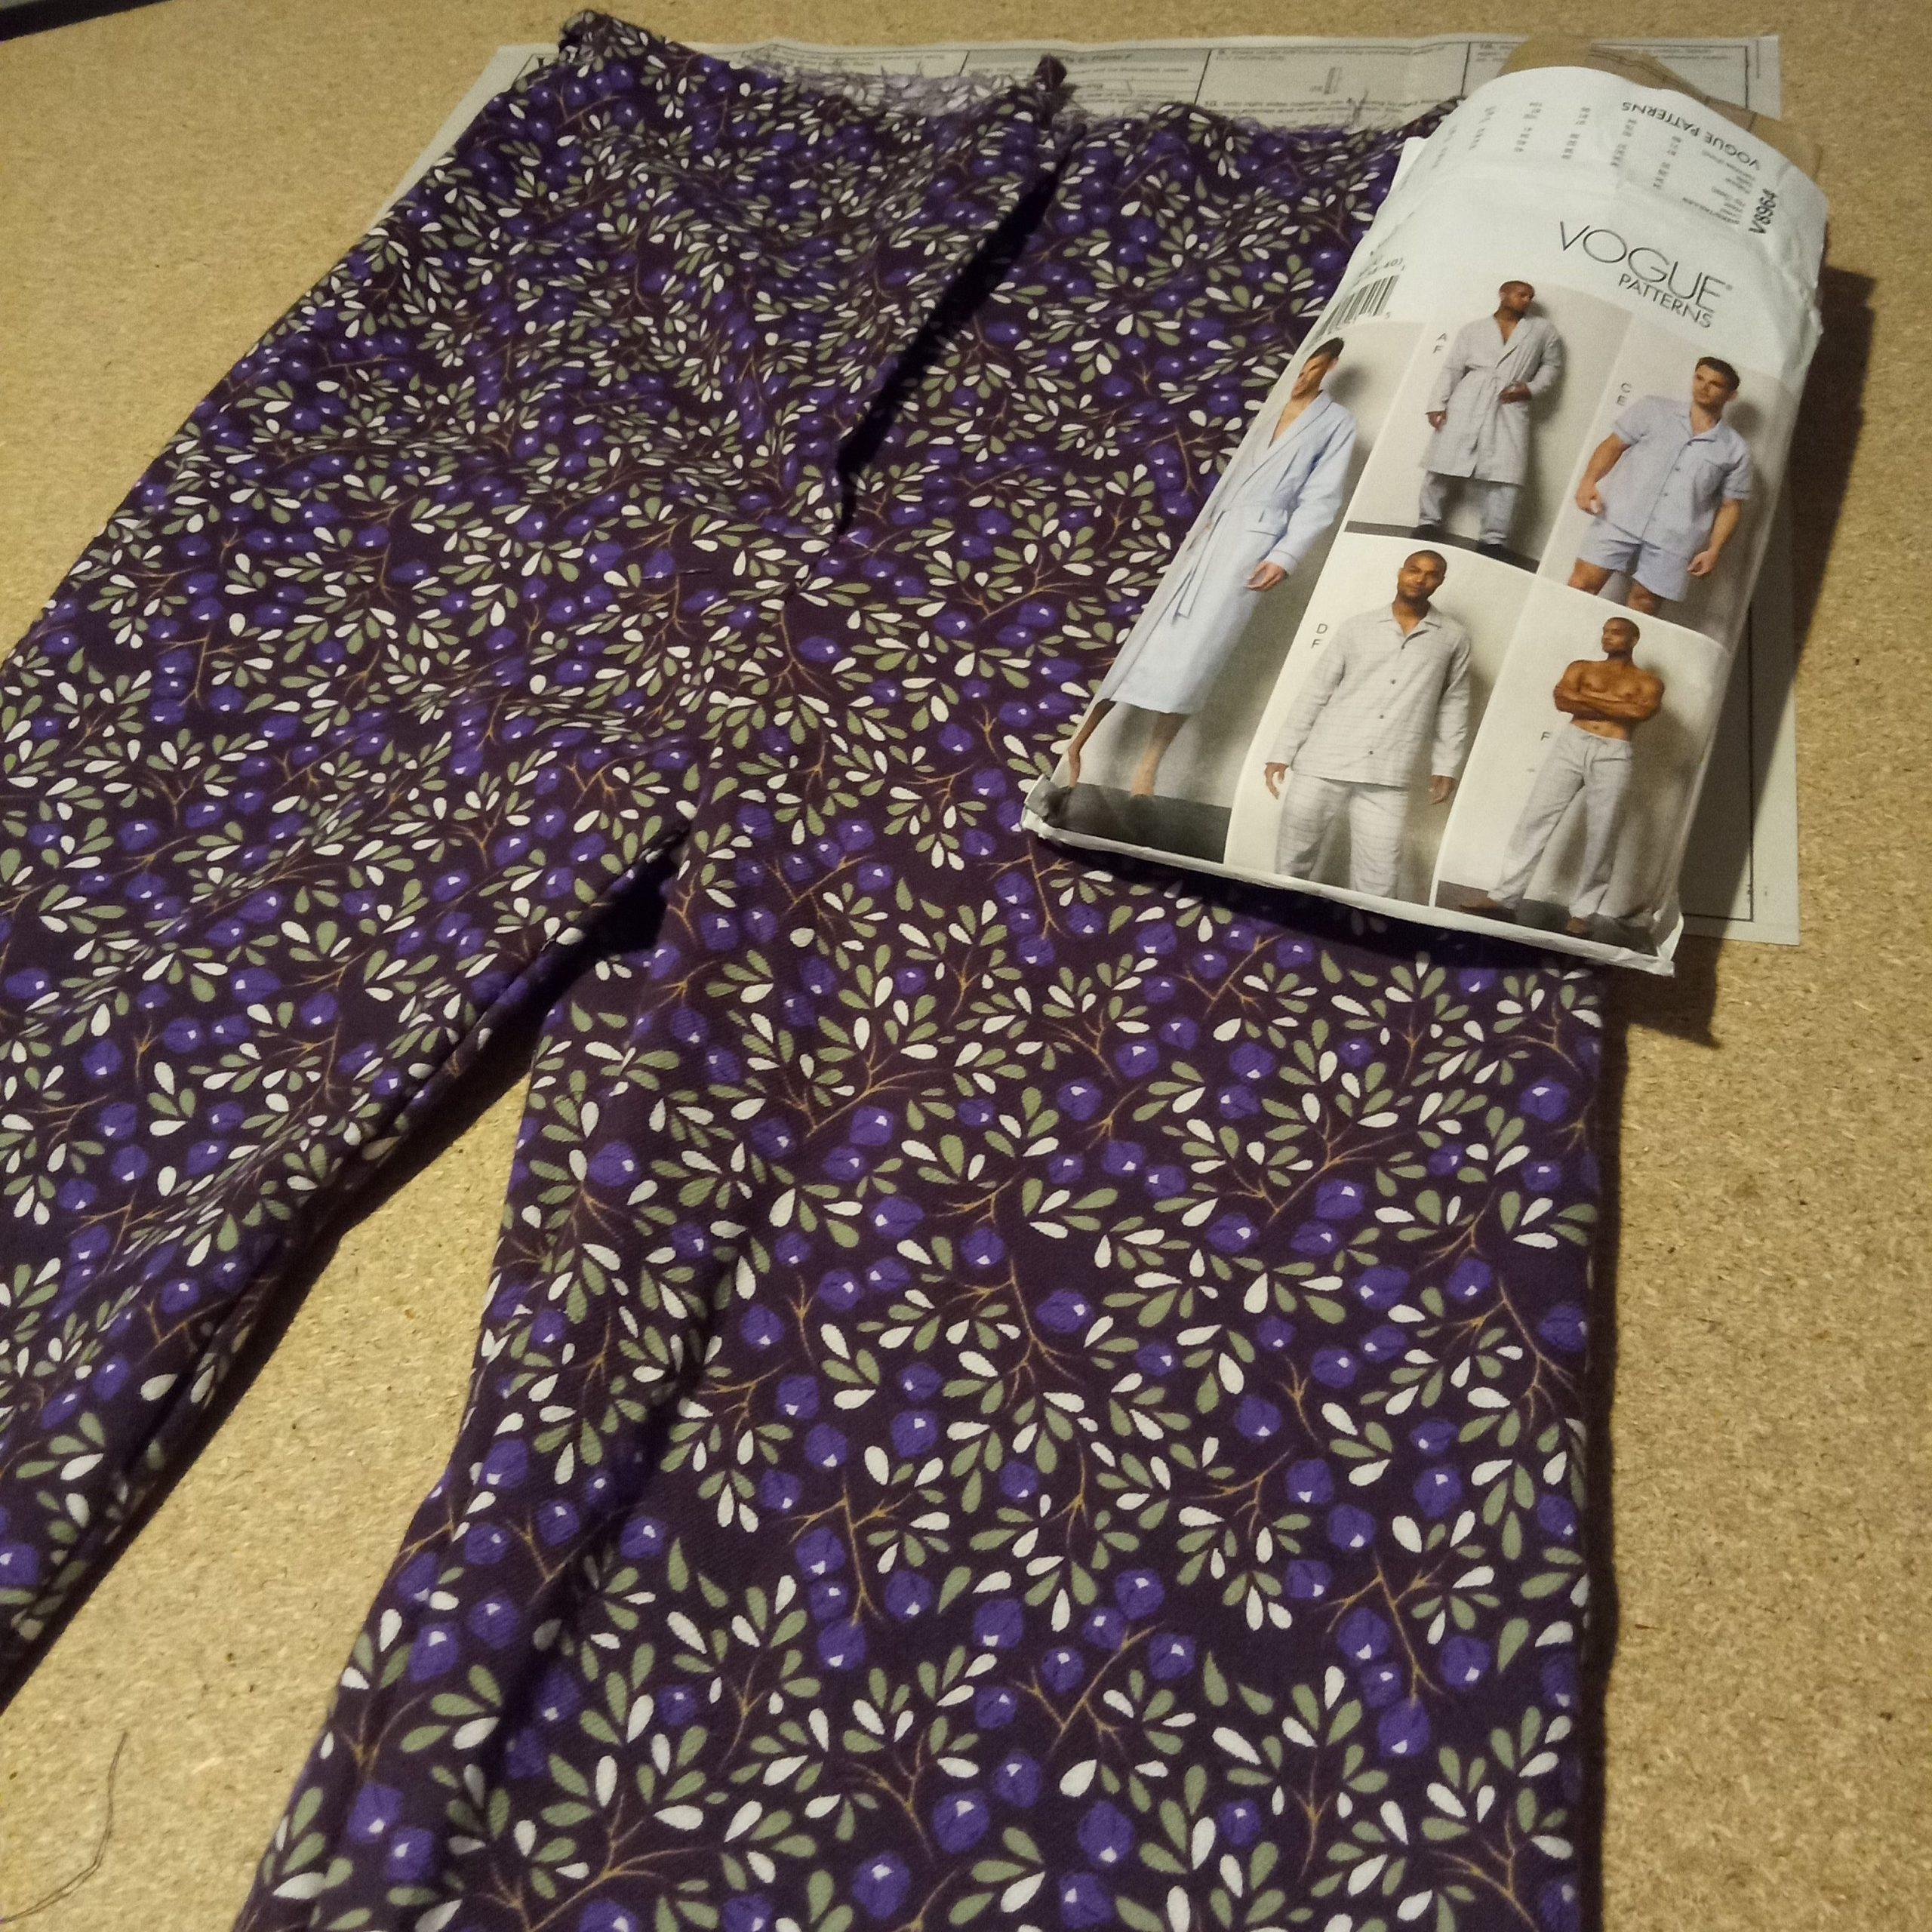 Student Stories - Helen W - Pyjamas